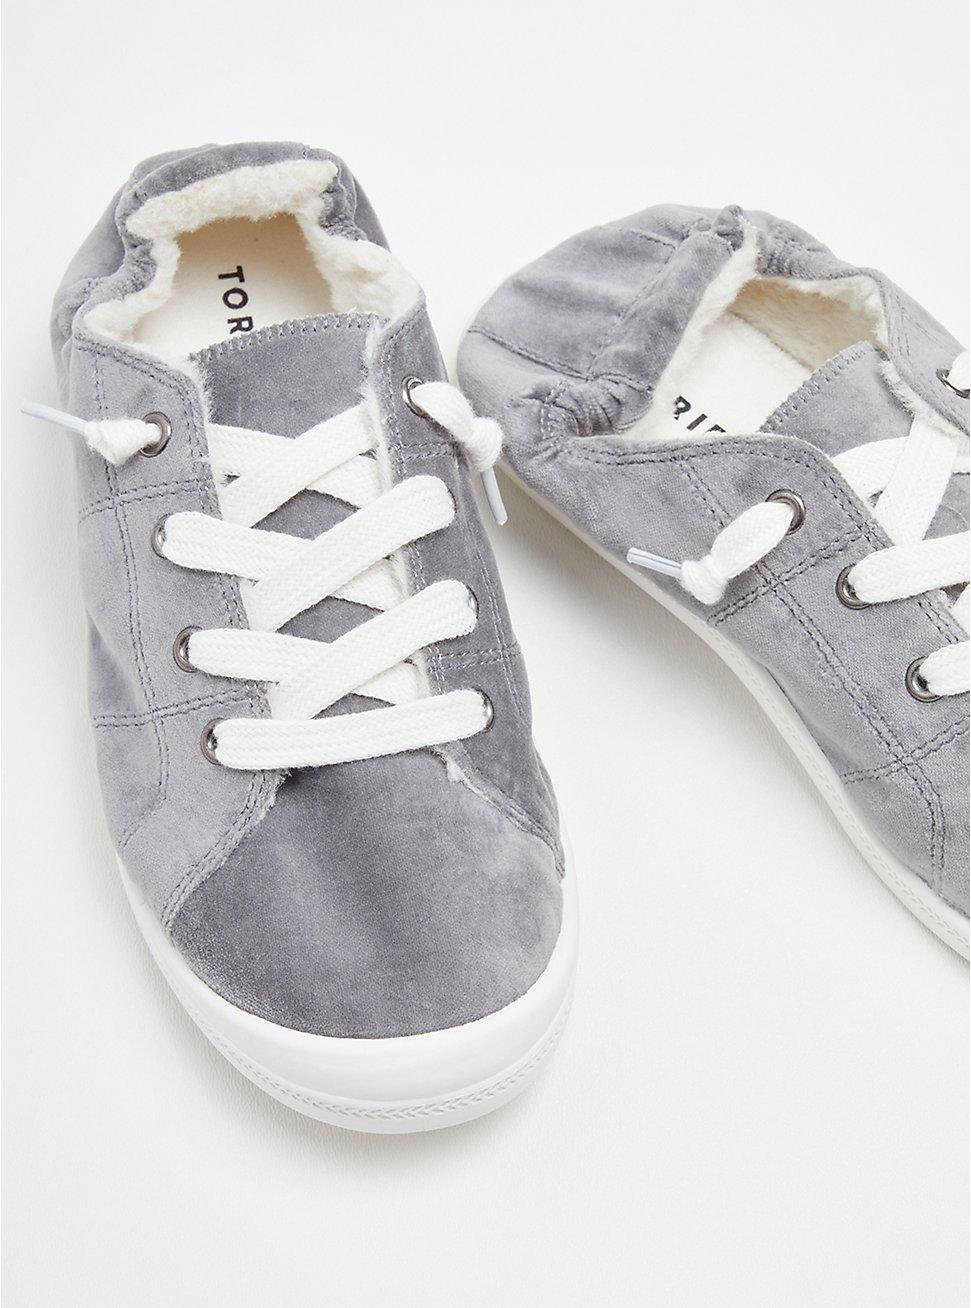 Plus Size Riley Sneaker - Velvet Fur Lined Grey (WW), GREY, hi-res